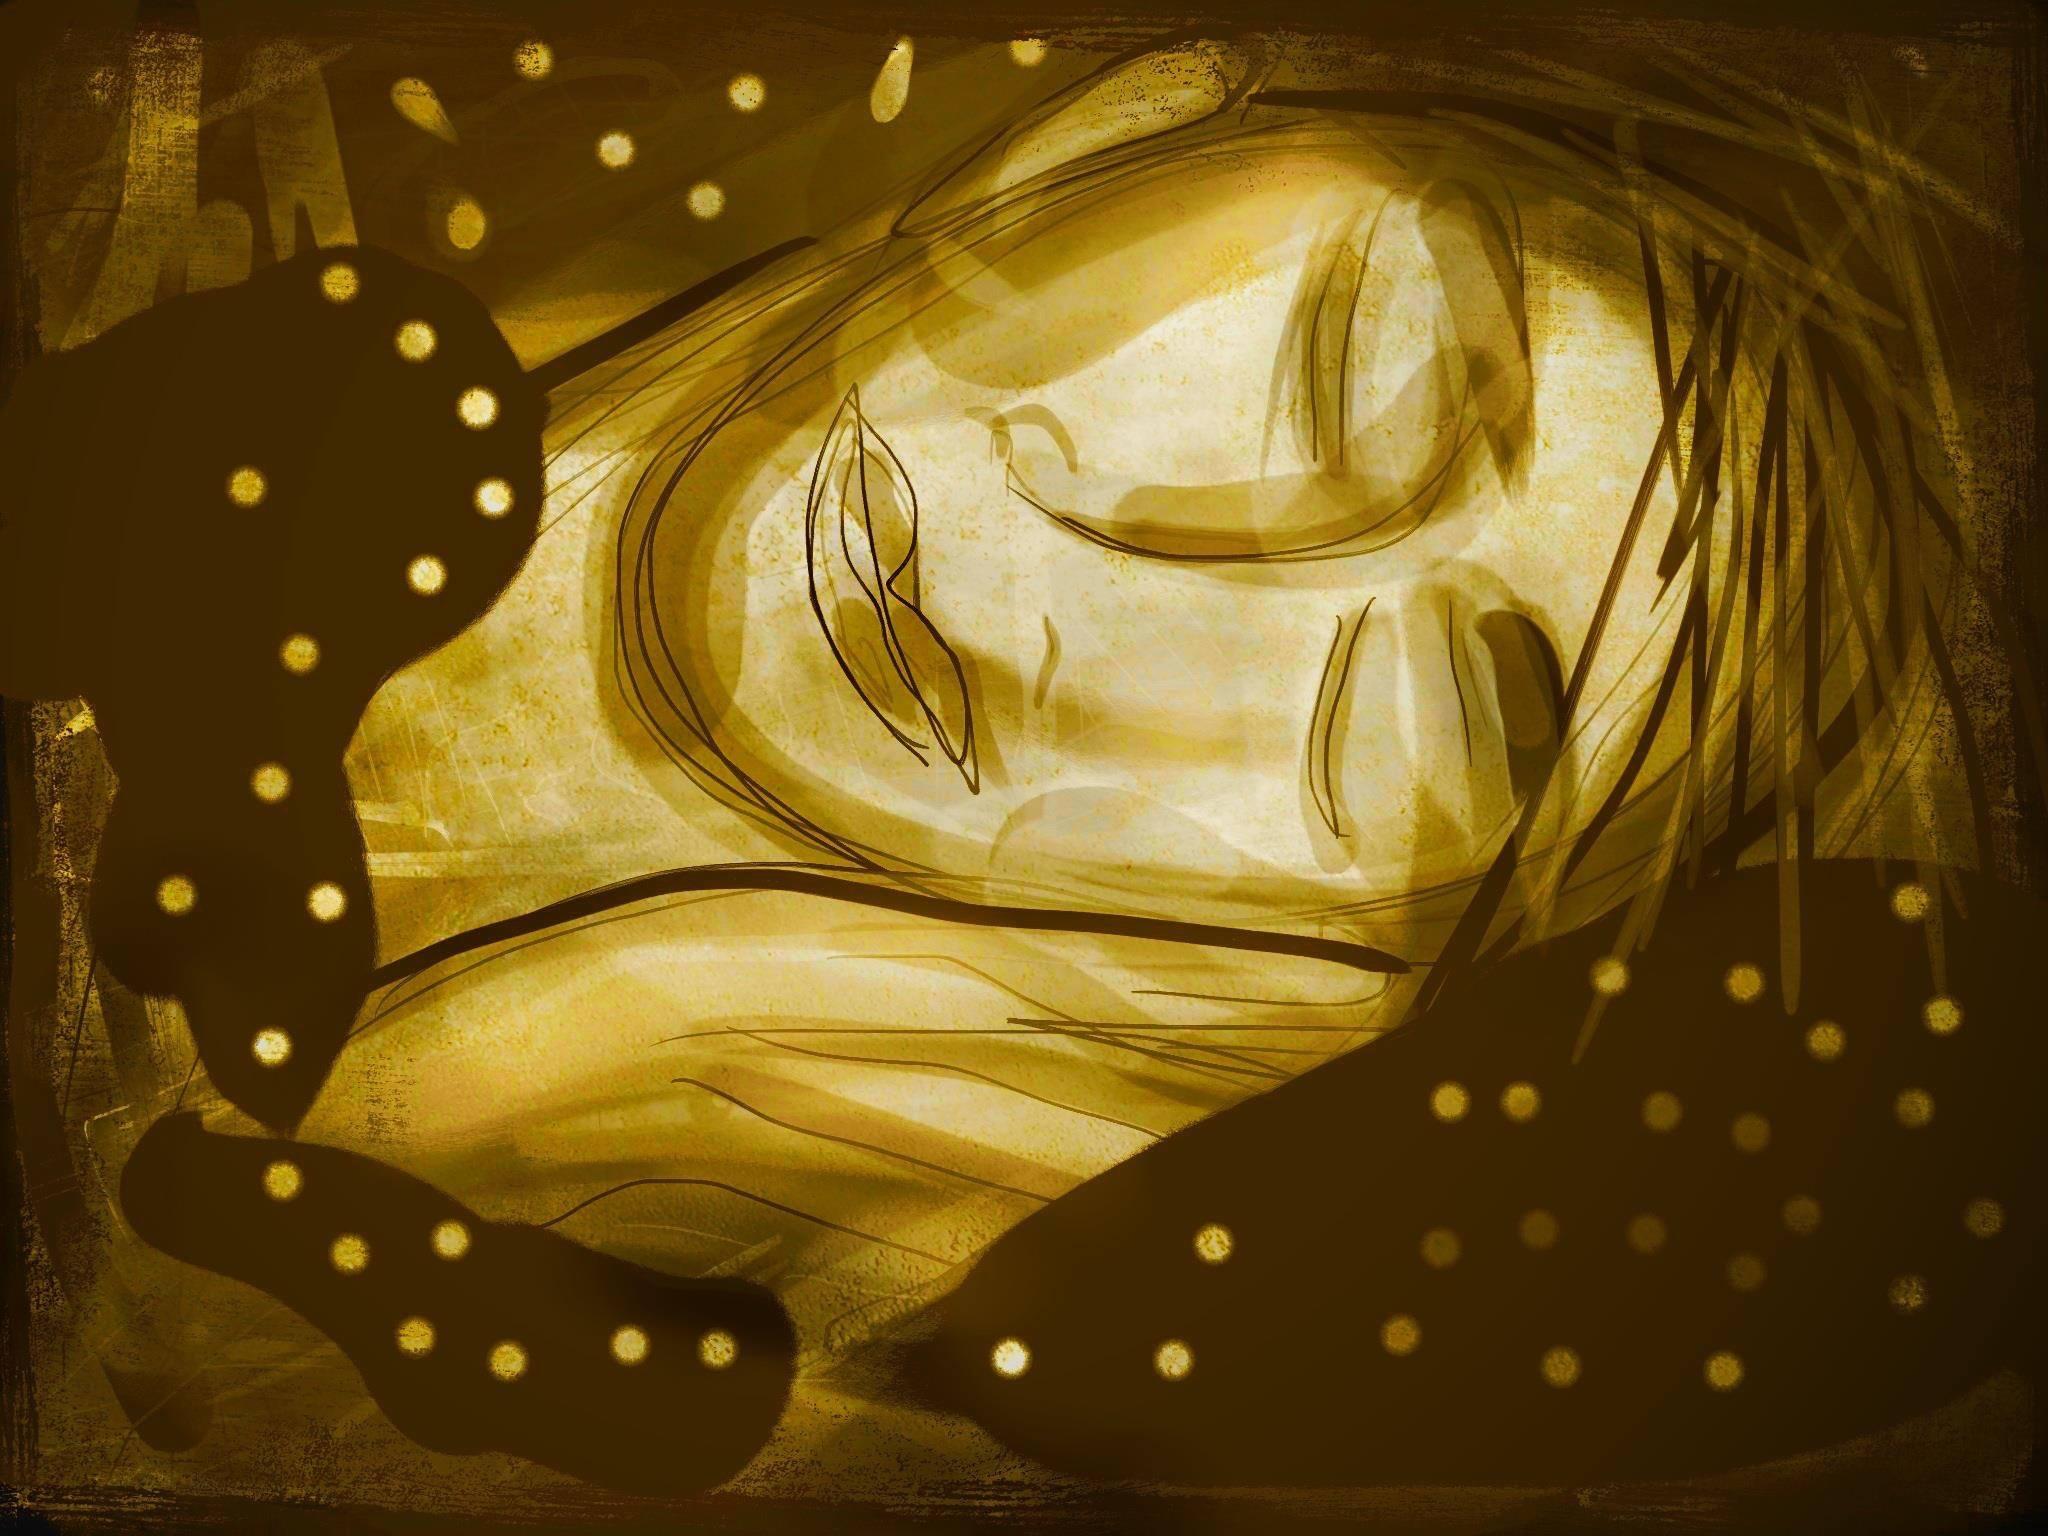 Sleeping, lllustration Malin Skinnar